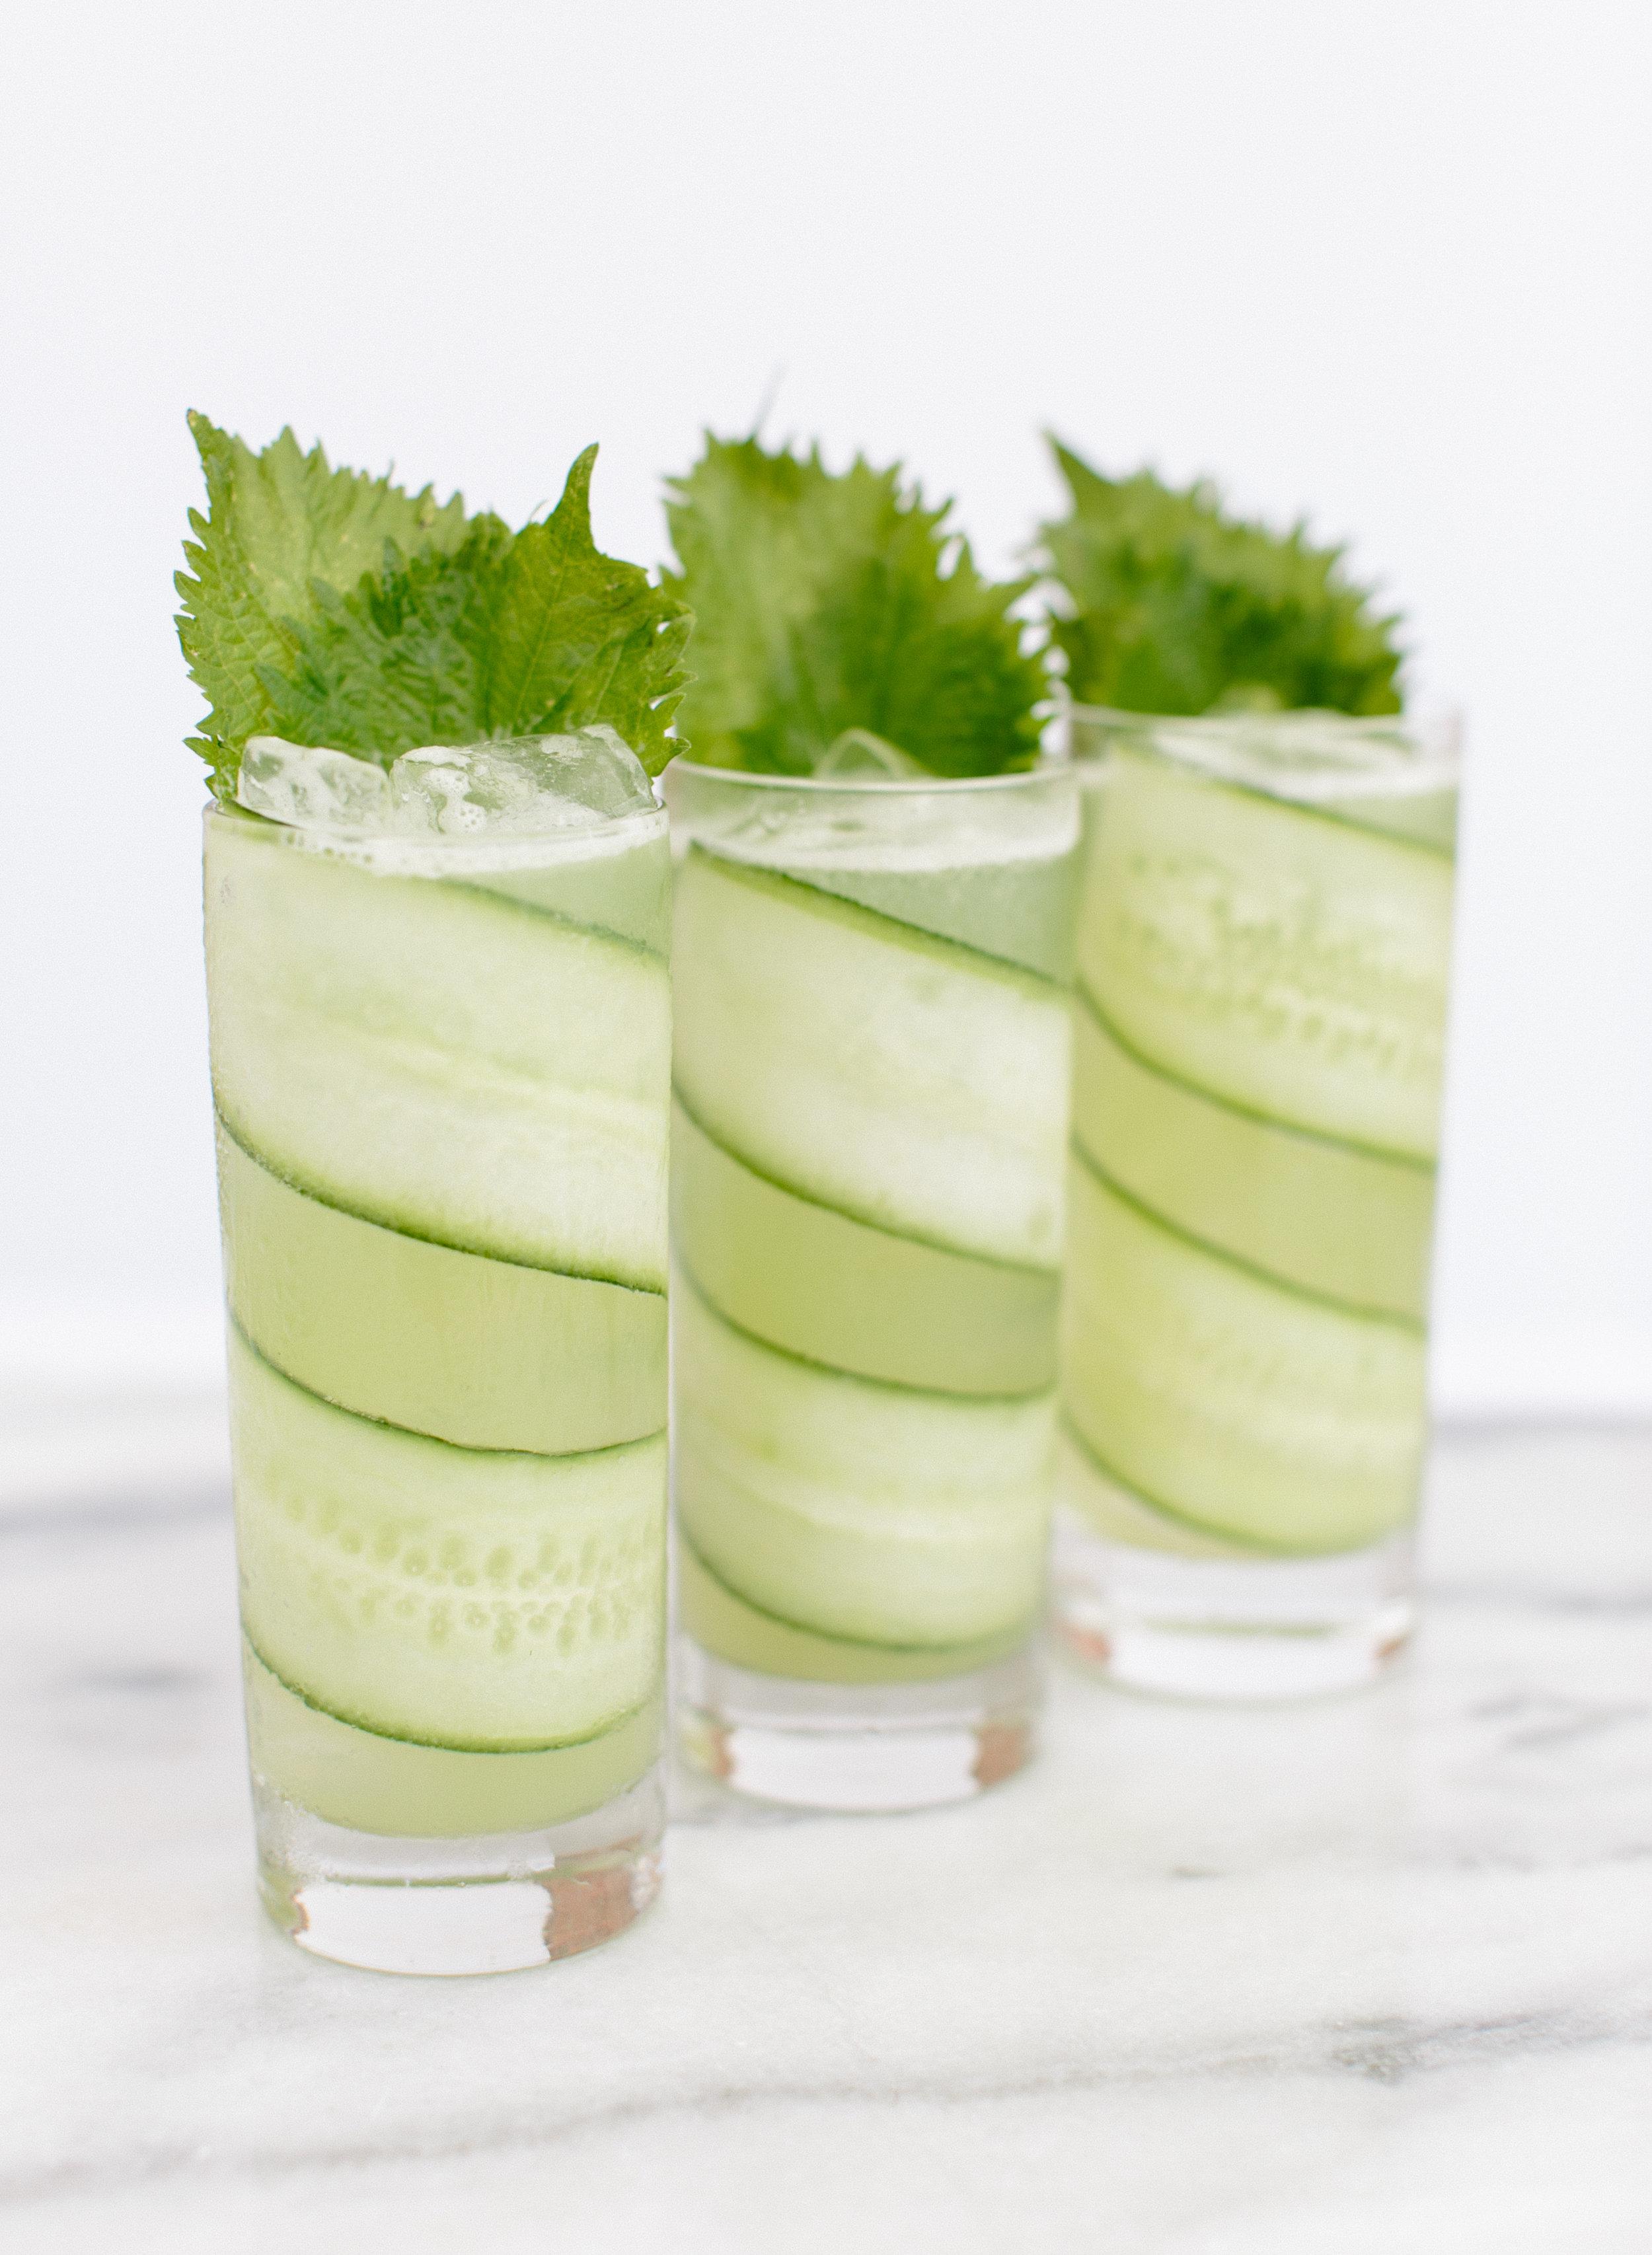 The Green Whisper - Glass – highballMethod – shake and strainGarnish – long thin cucumber spiral; 2 shiso leaves2 oz. vodka or gin1.25 oz. fresh English cucumber juice.75 oz. fresh lime juice.75 oz. house-made green peppercorn syrup